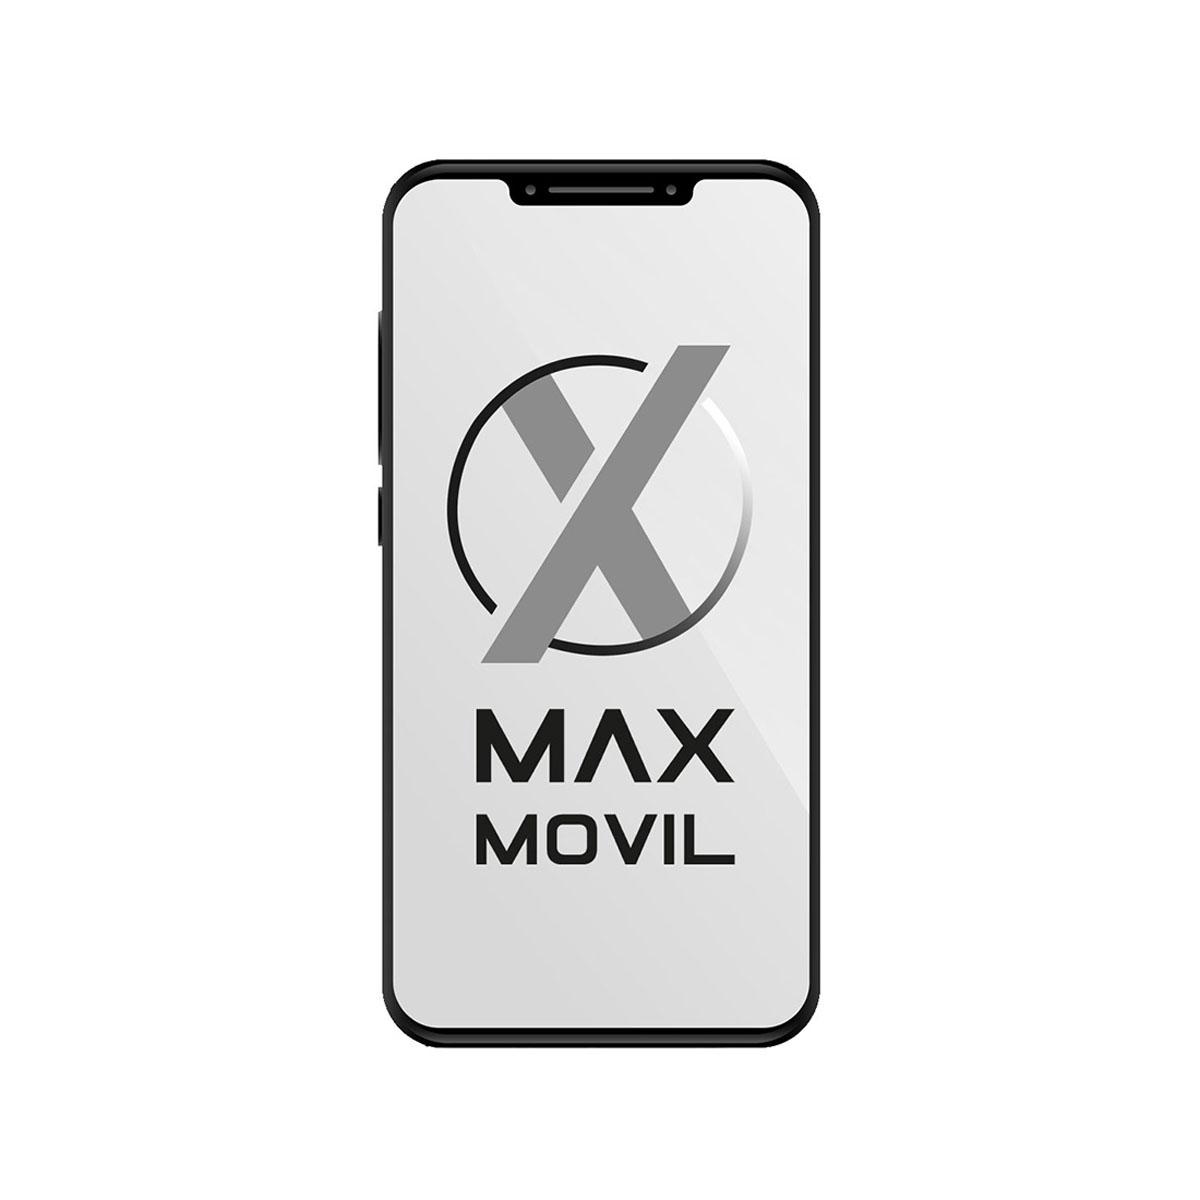 Modulo Panasonic kx-ns5173, de 8 extensiones regulares/ analogica (mcslc8)